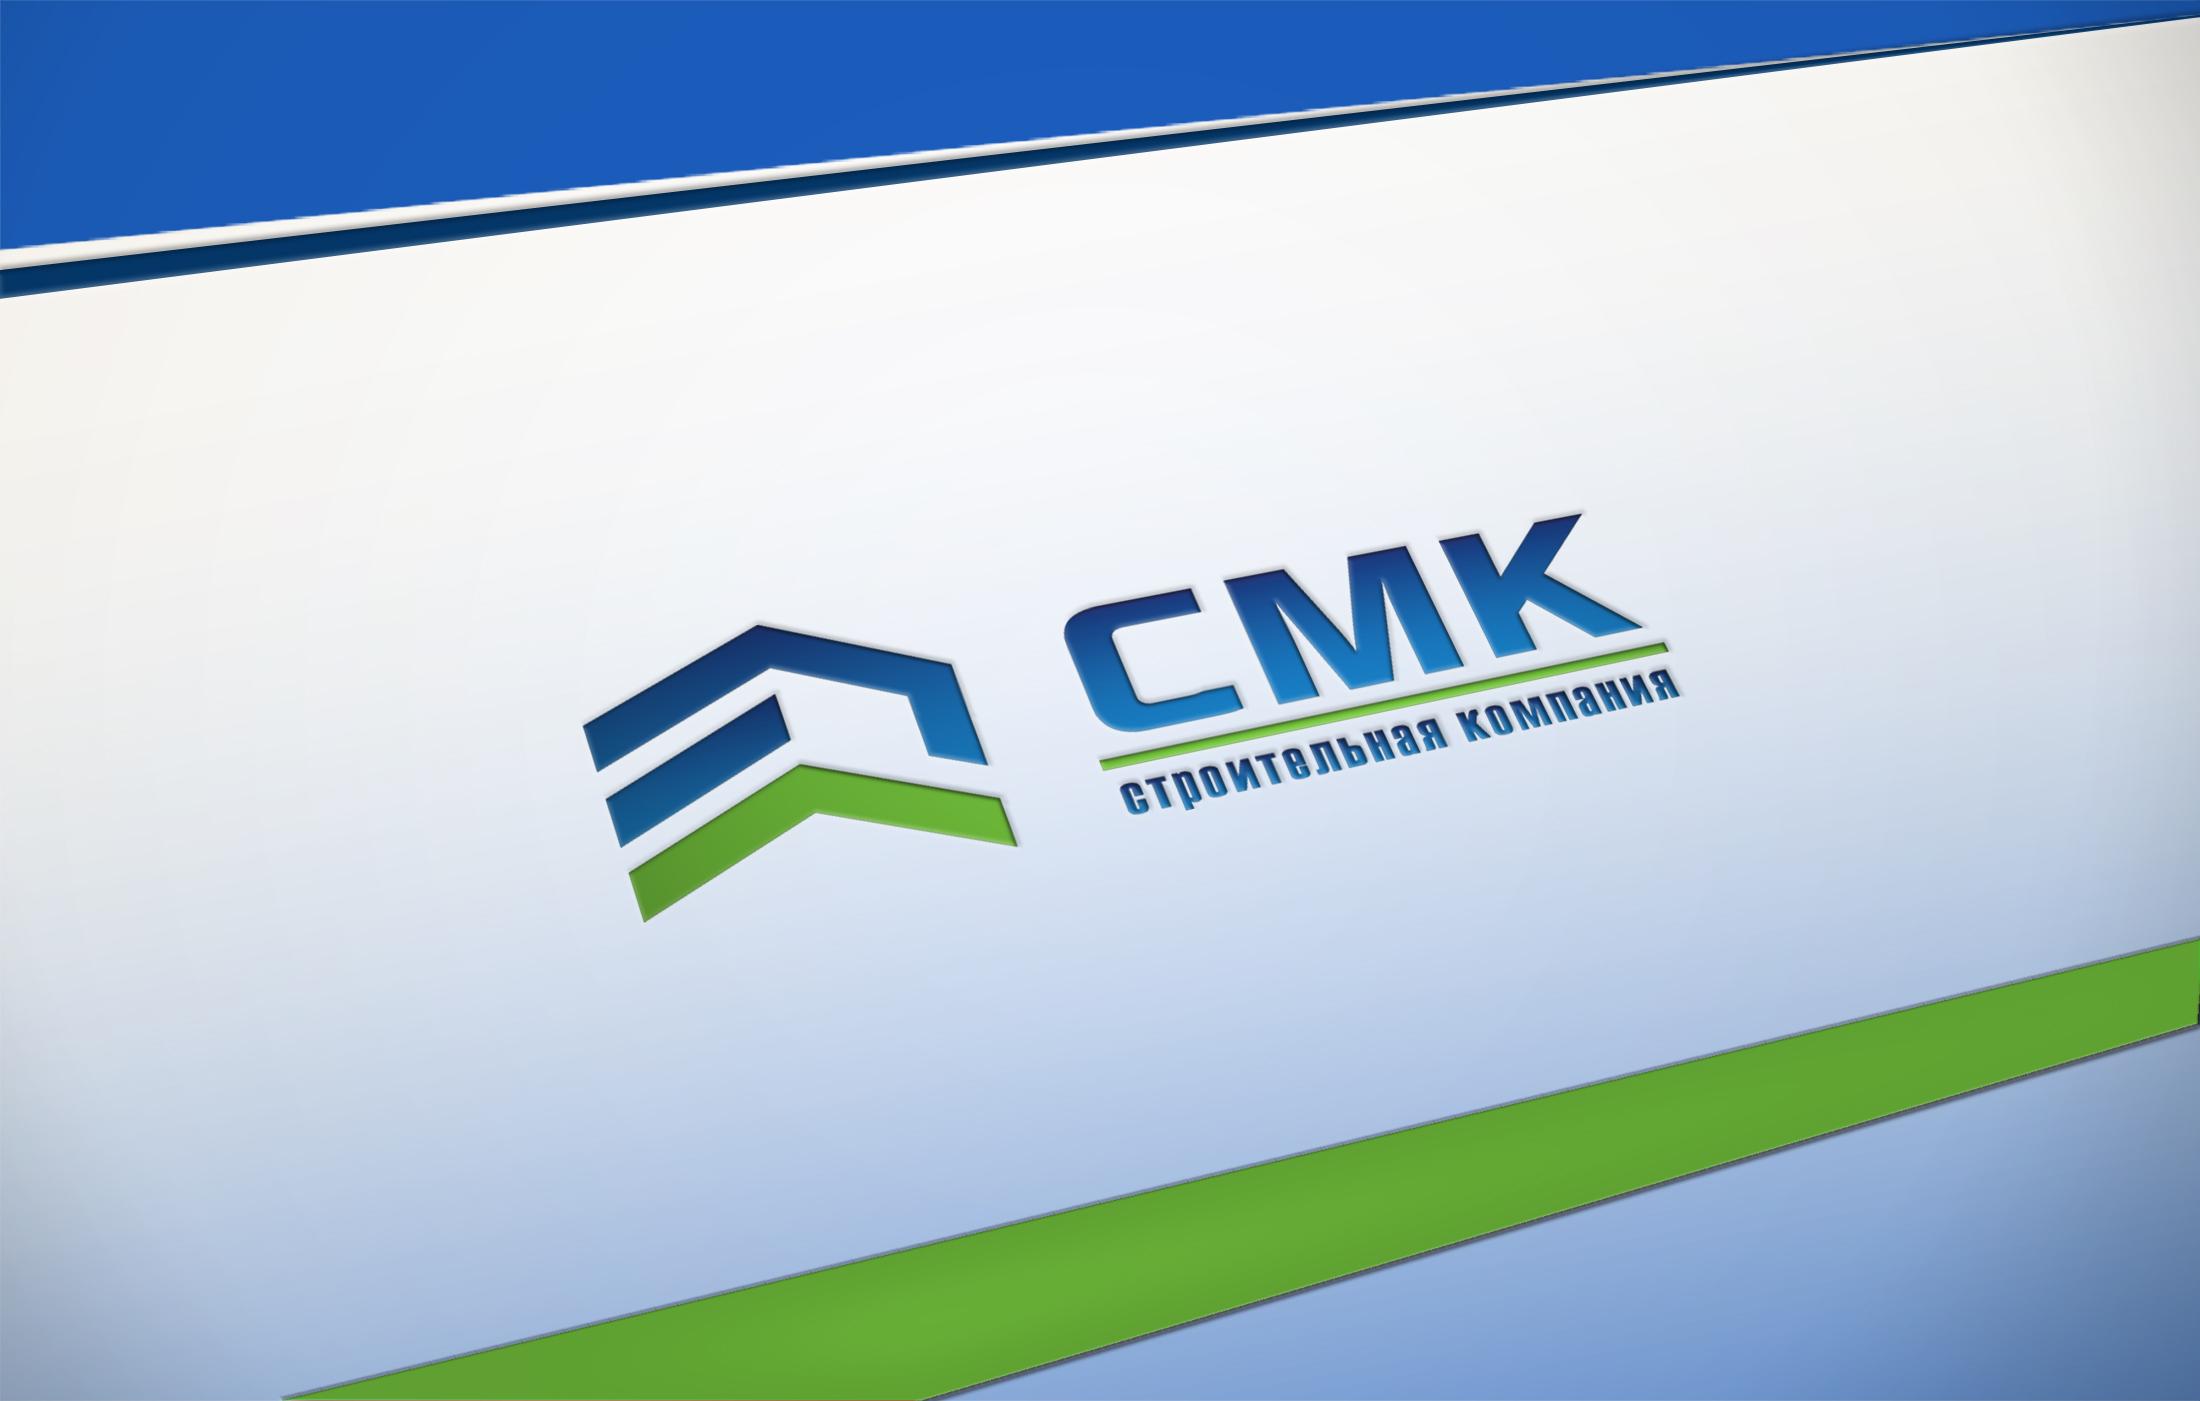 Разработка логотипа компании фото f_4005de285c9d645b.jpg